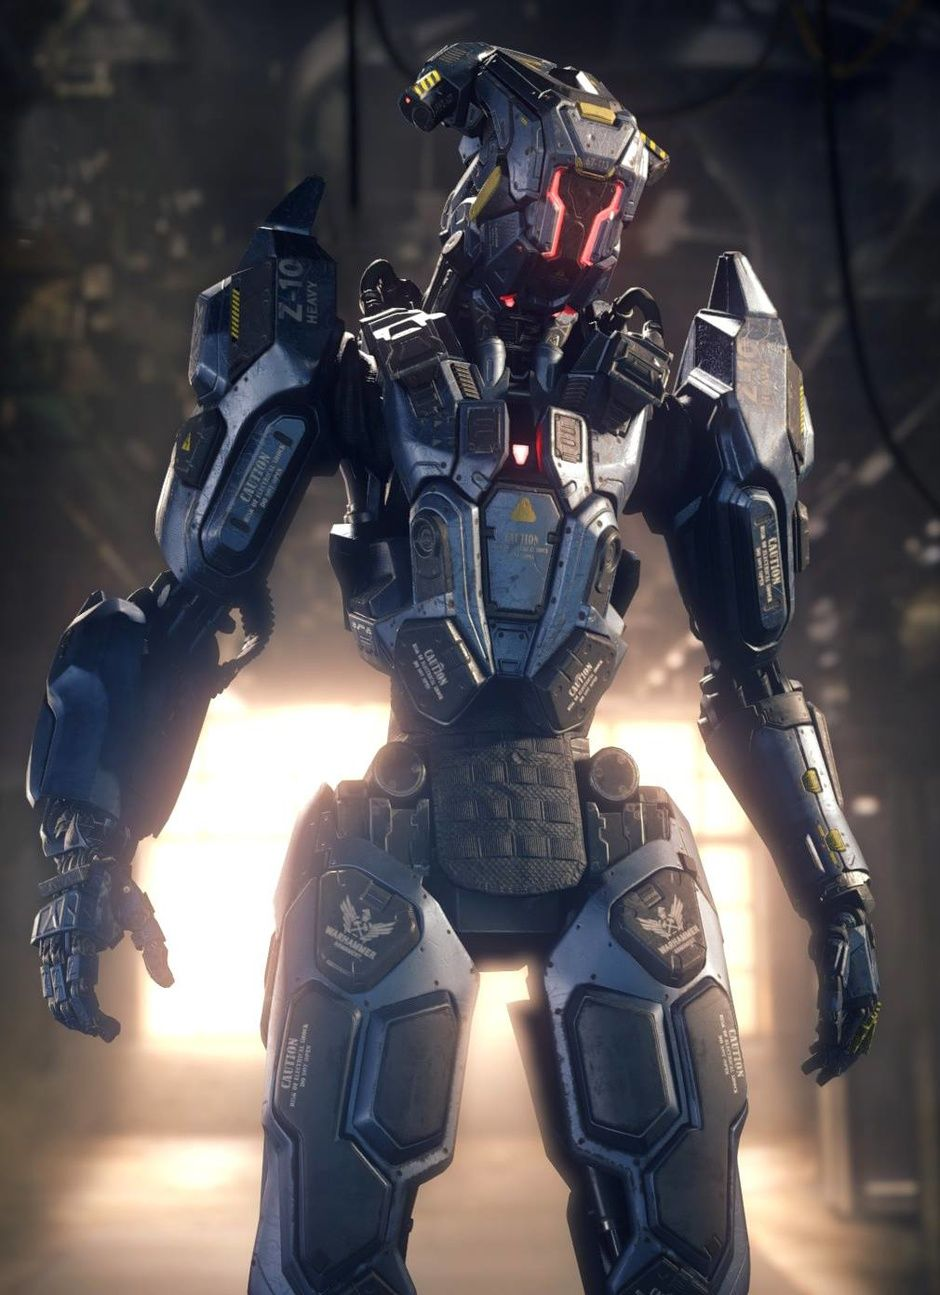 call of duty black ops 3 reaper variant 2peter zoppi | robotic